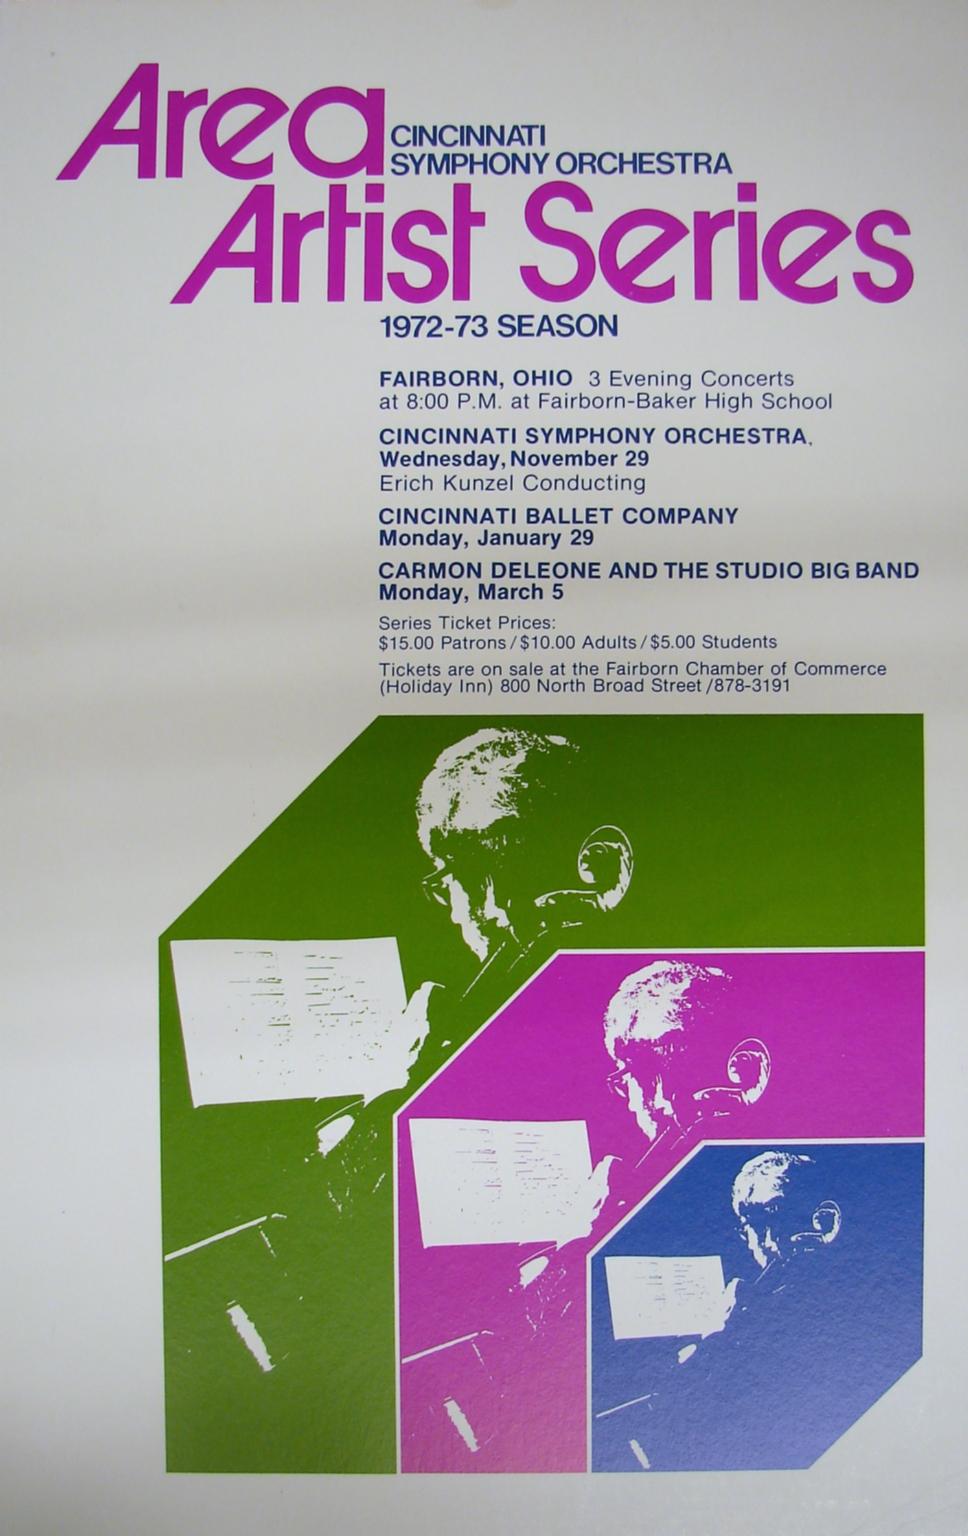 Area Artist Series, 1972-73 Season